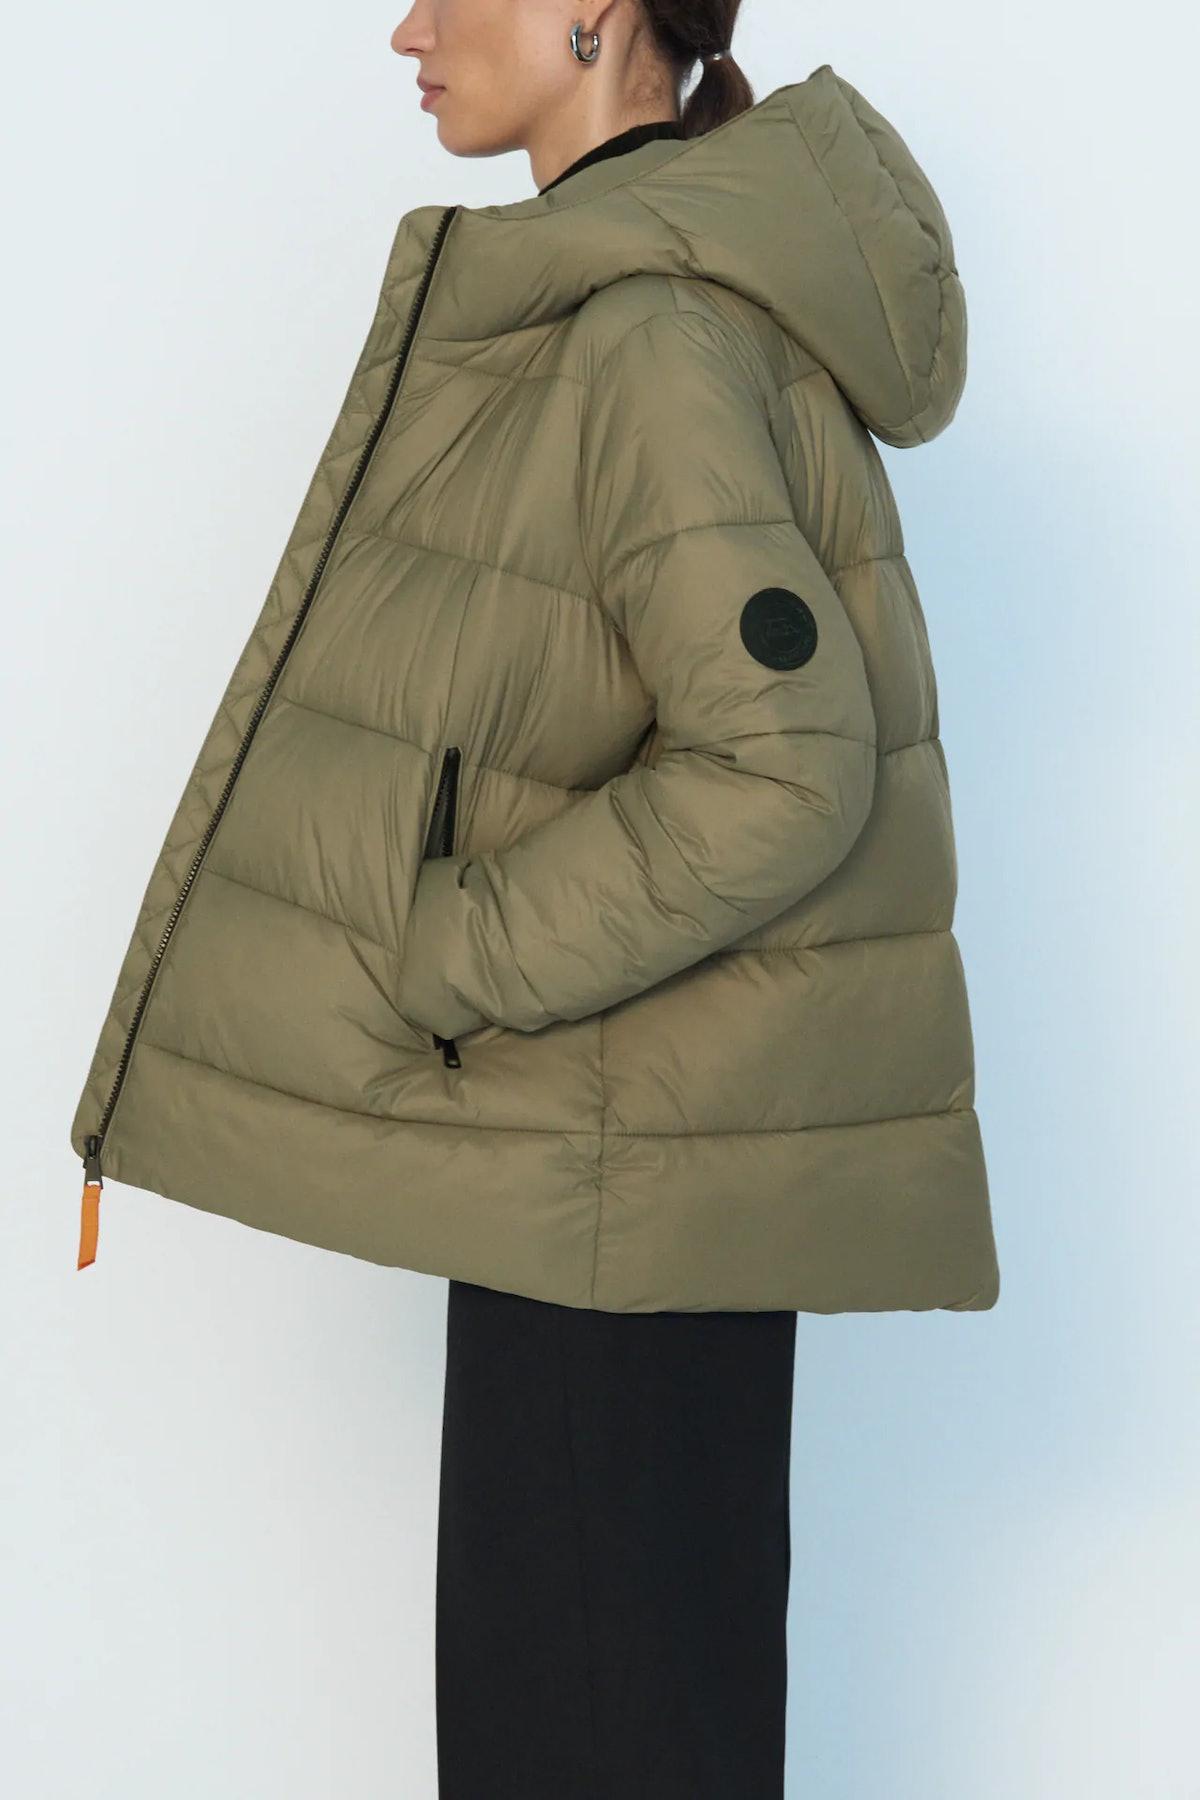 Comfortemp Thermal Insulation Puffer Jacket